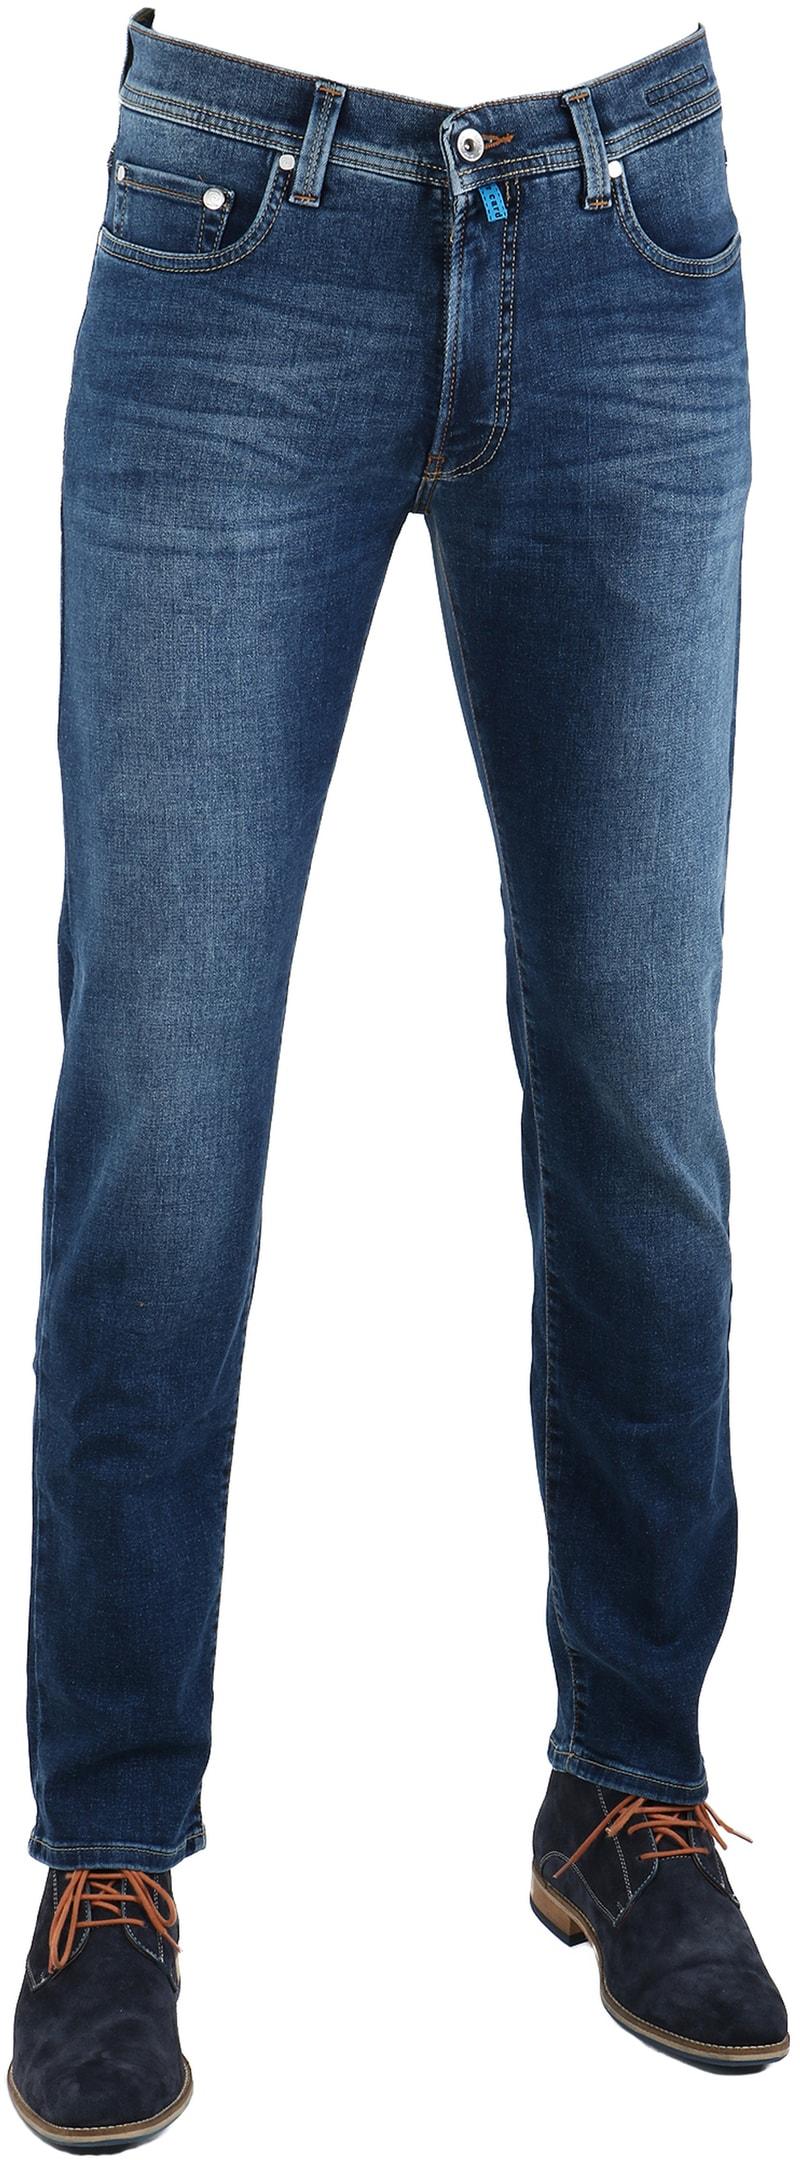 Pierre Cardin Lyon Jeans Future Flex 3451  online bestellen | Suitable